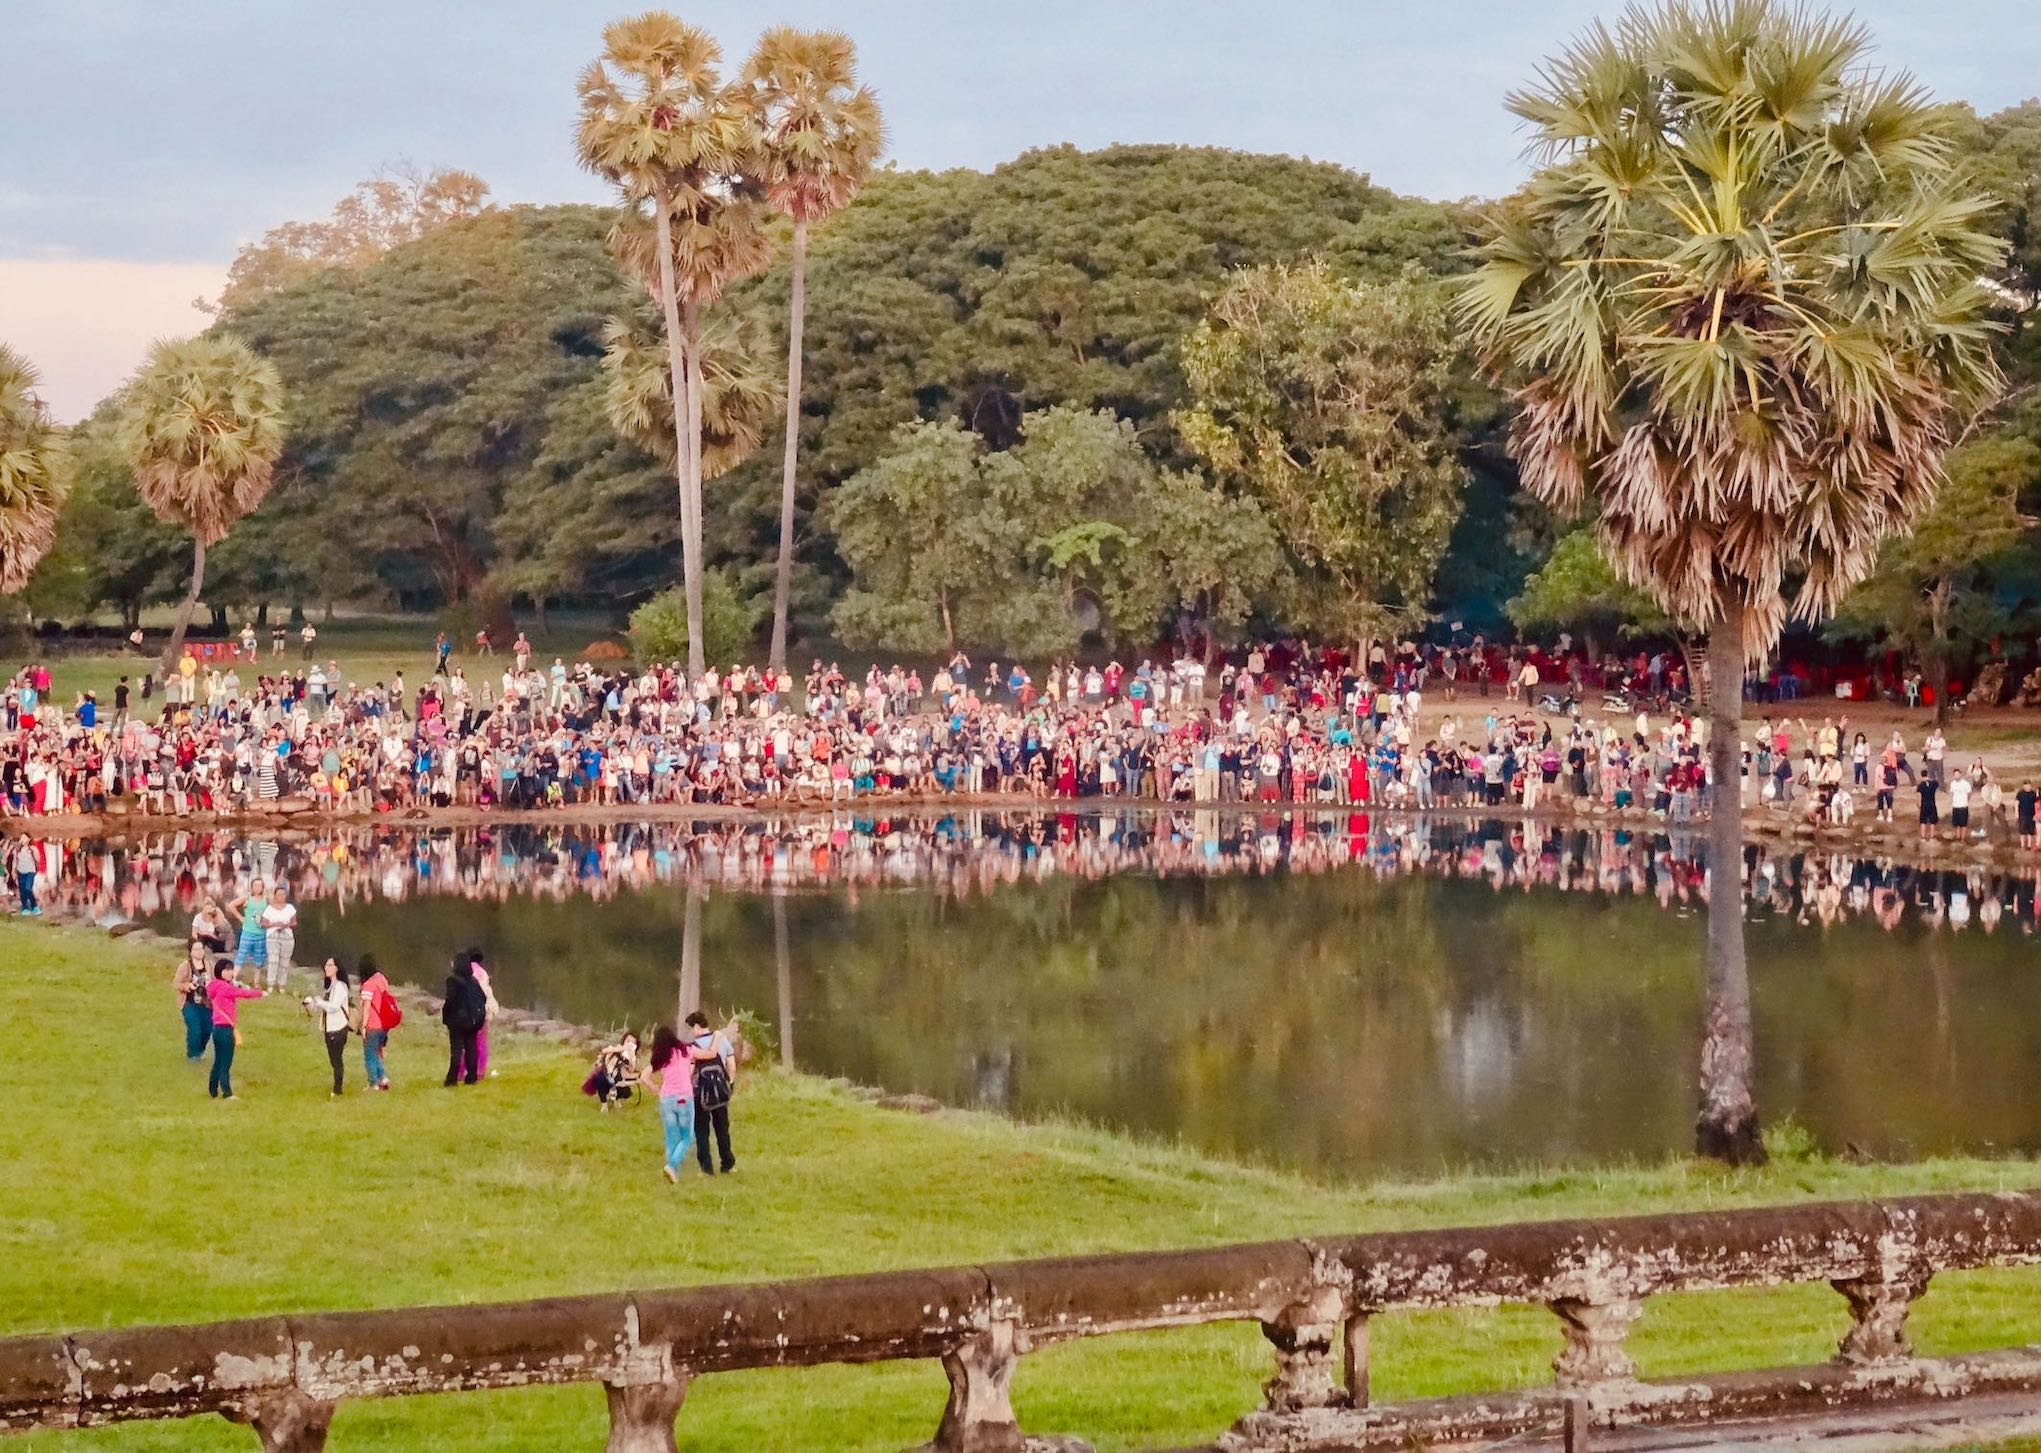 Sunset crowds gather at Angkor Wat